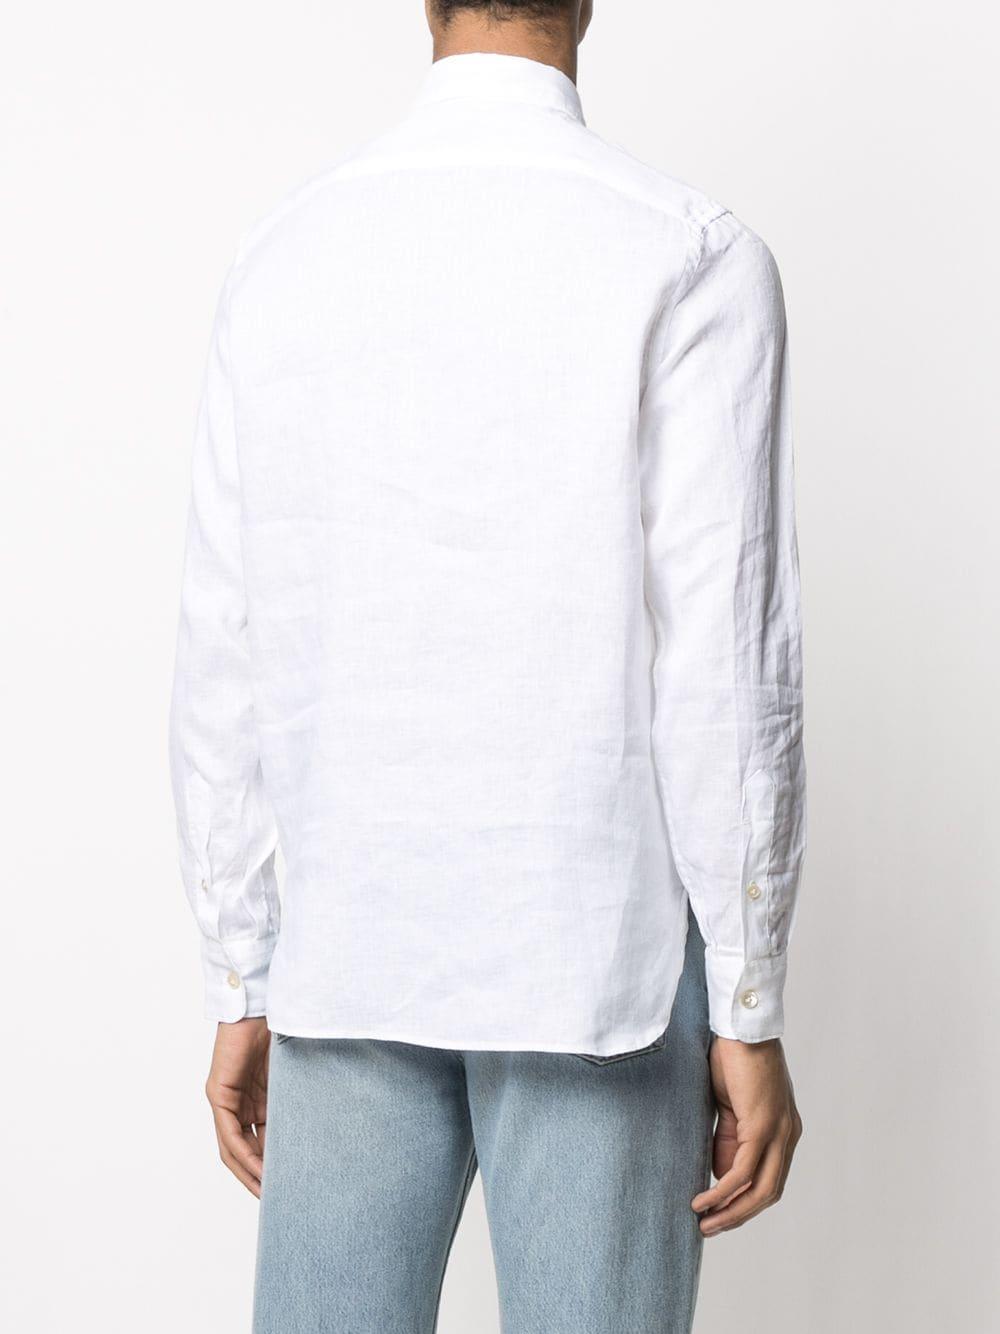 White linen shirt featuring henley neck ELEVENTY |  | C75CAMC08-TES0A00101